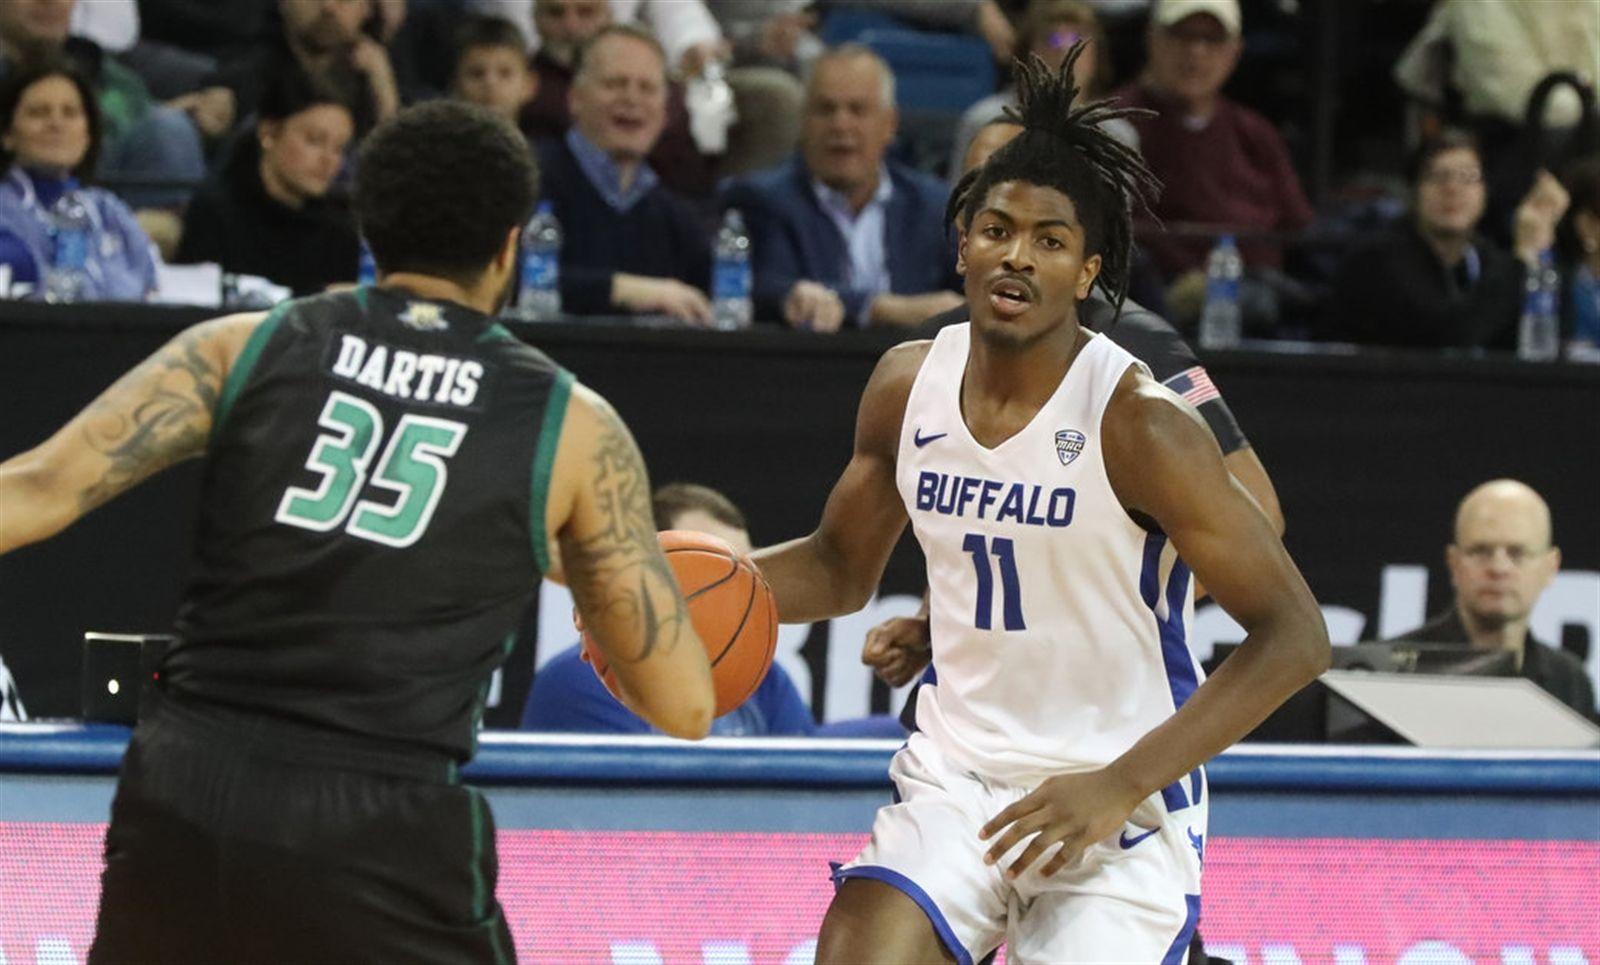 Buffalo Bulls forward Jeenathan Williams (11) dribbles the ball up the court against Ohio Bobcats guard Jordan Dartis (35) in the first half.